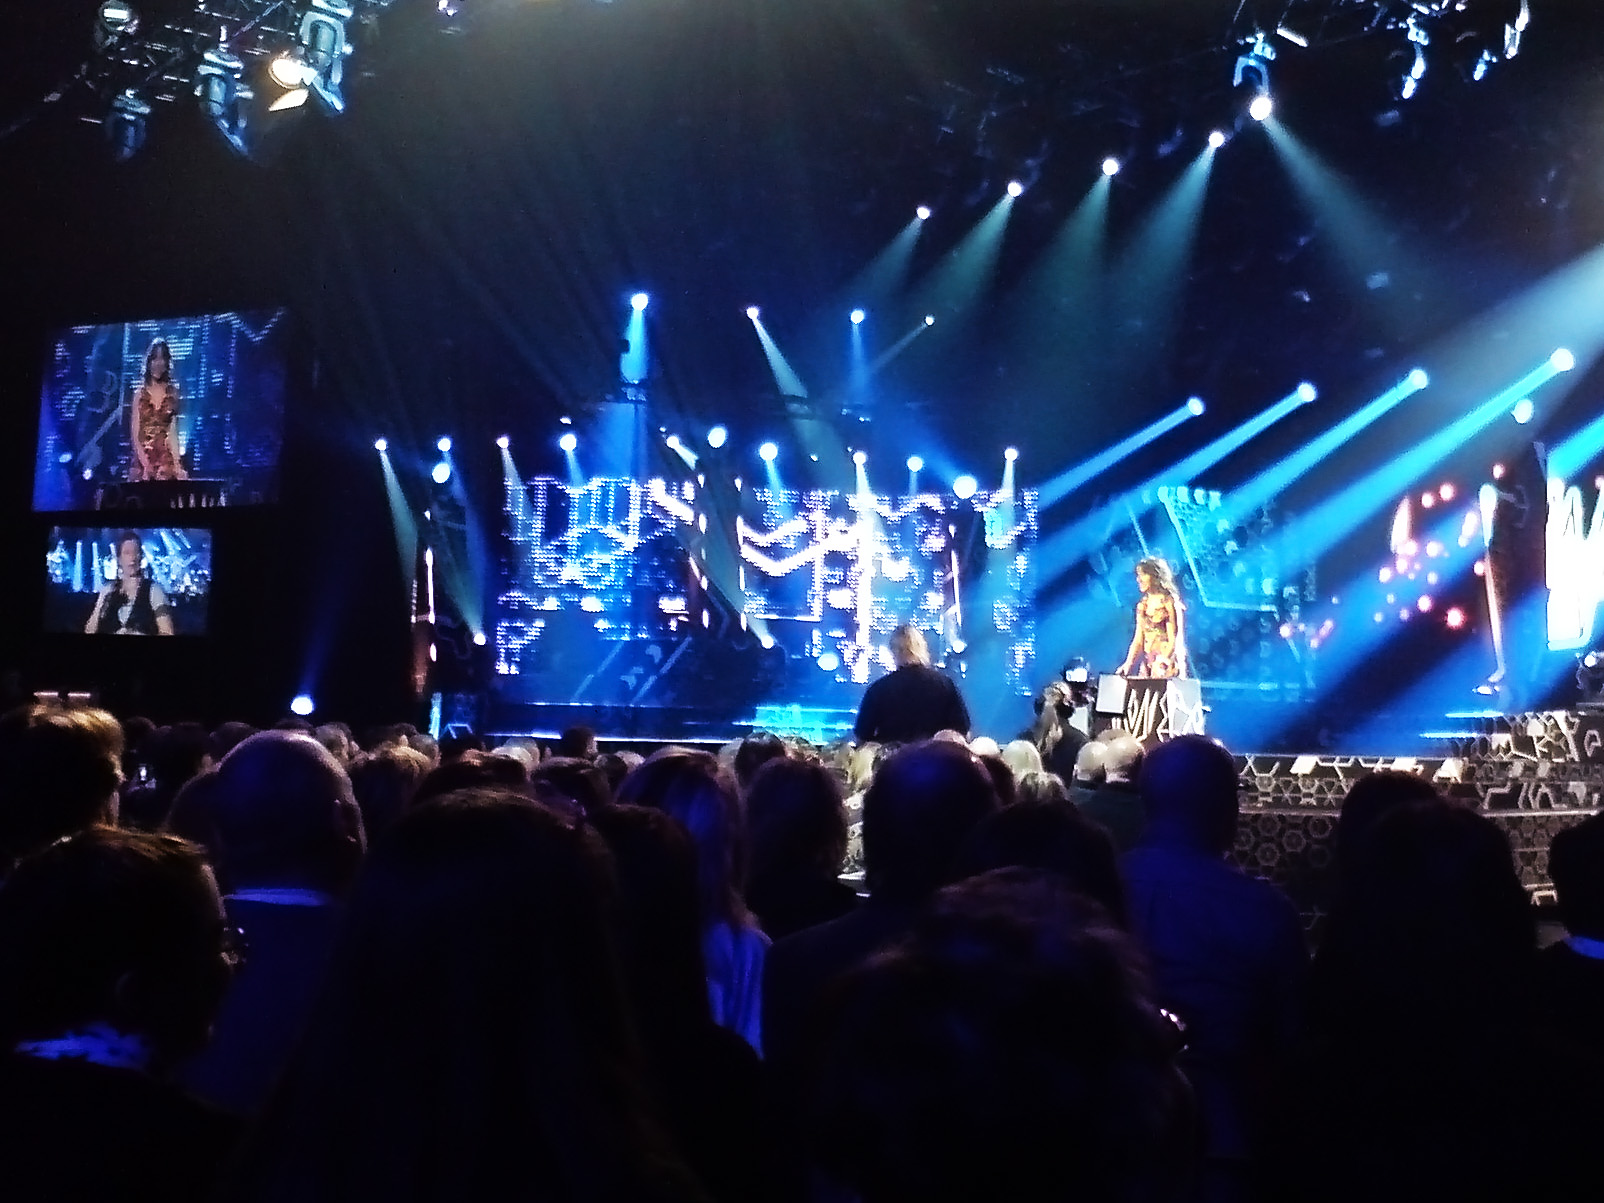 Depiction of Melodifestivalen